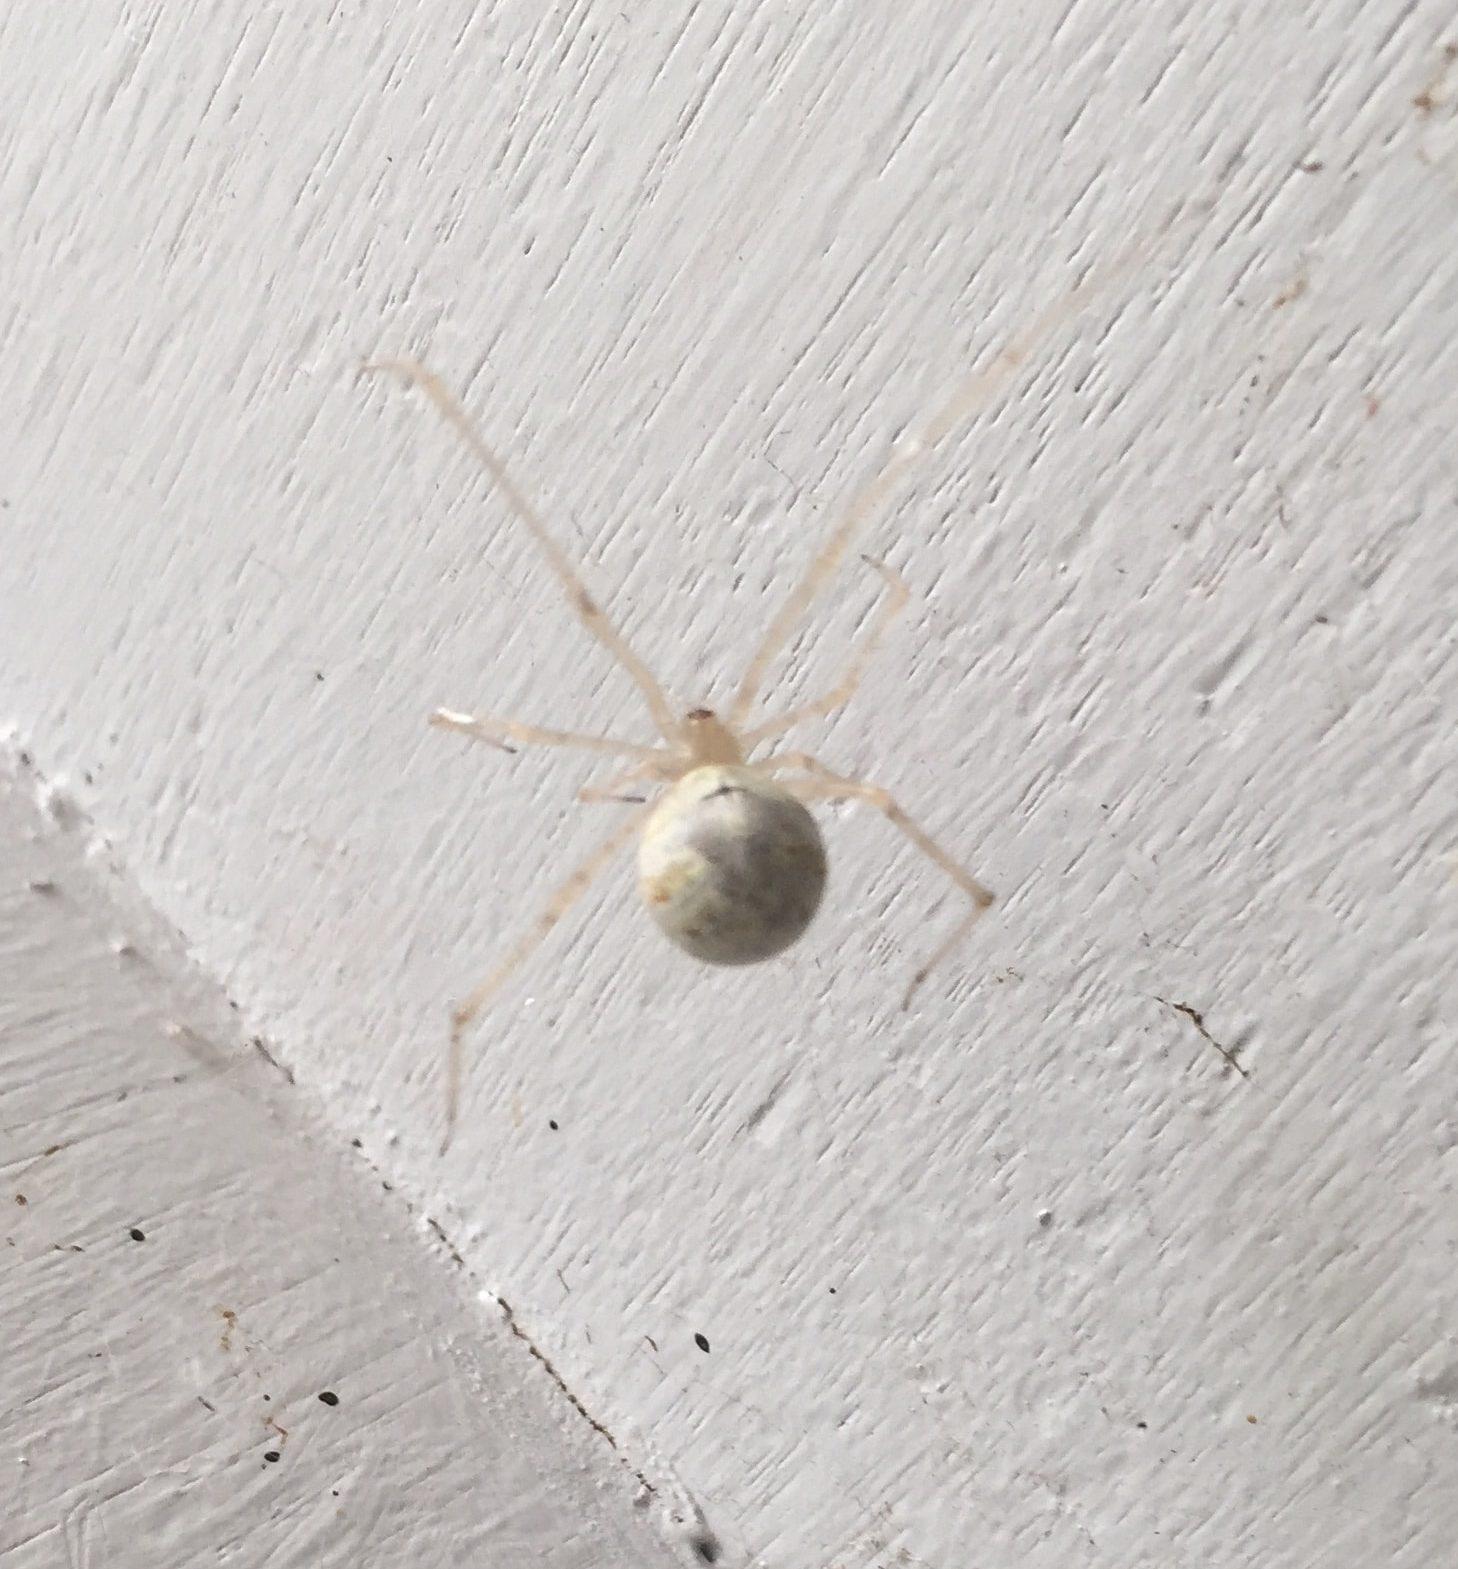 Picture of Cryptachaea gigantipes (White Porch Spider) - Dorsal